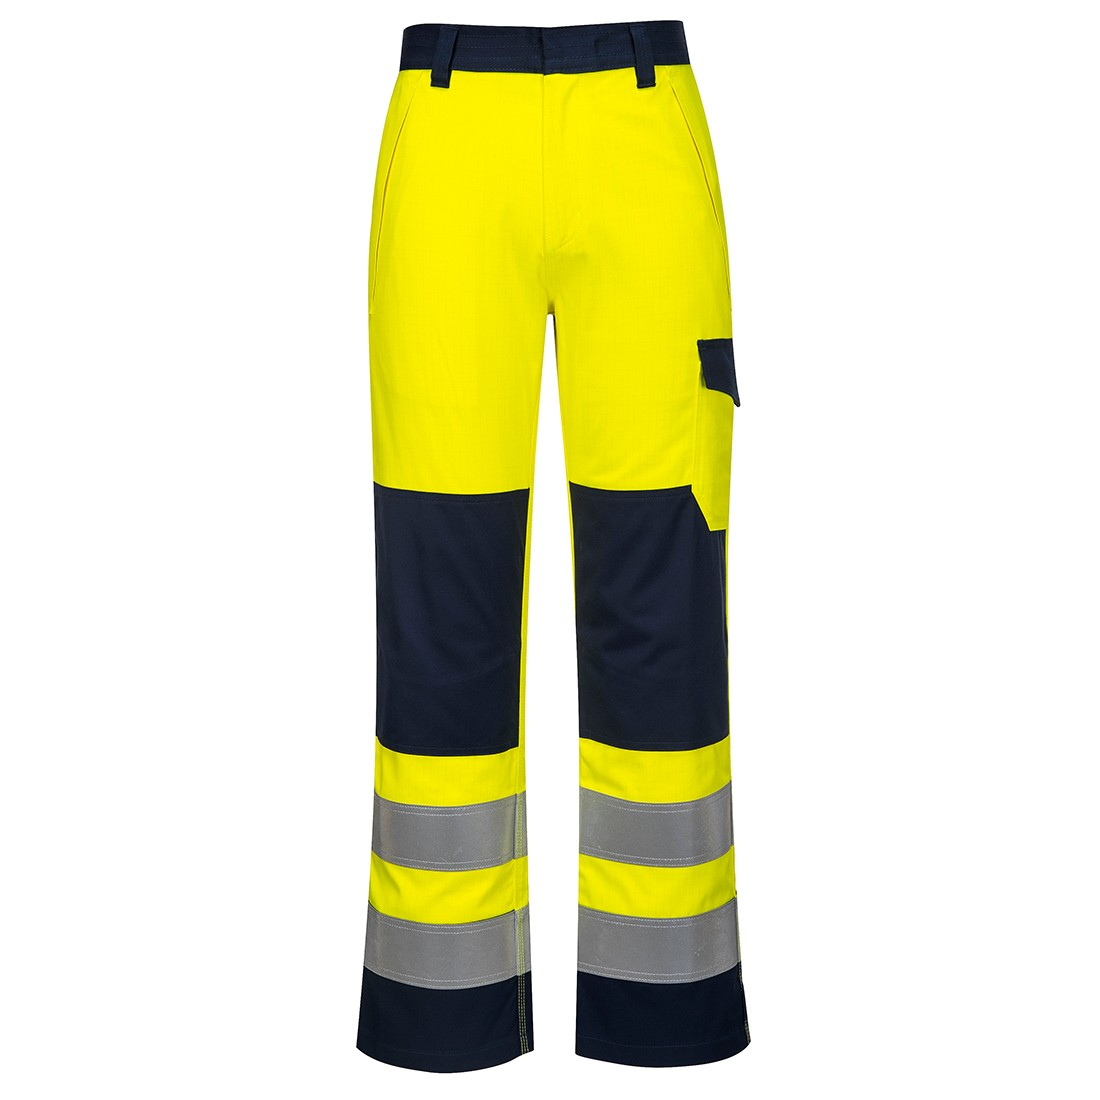 Pantaloni Modaflame Hi-Vis - Imbracaminte de protectie